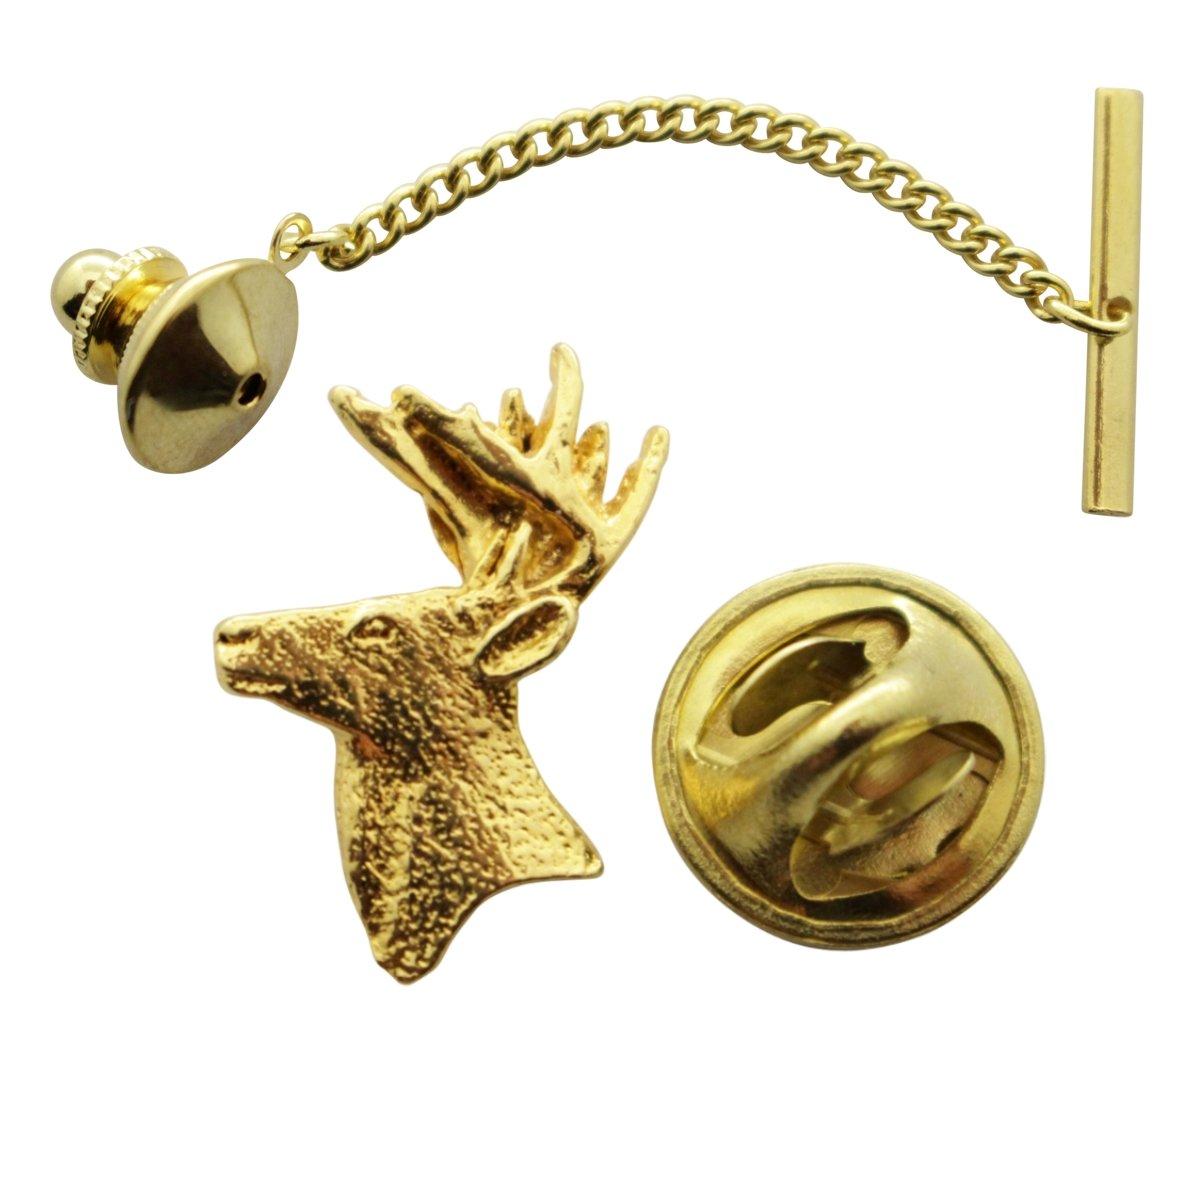 Buck Head Tie Tack ~ 24K Gold ~ Tie Tack or Pin ~ Sarah's Treats & Treasures G.G. Harris STT-M400-G-TT